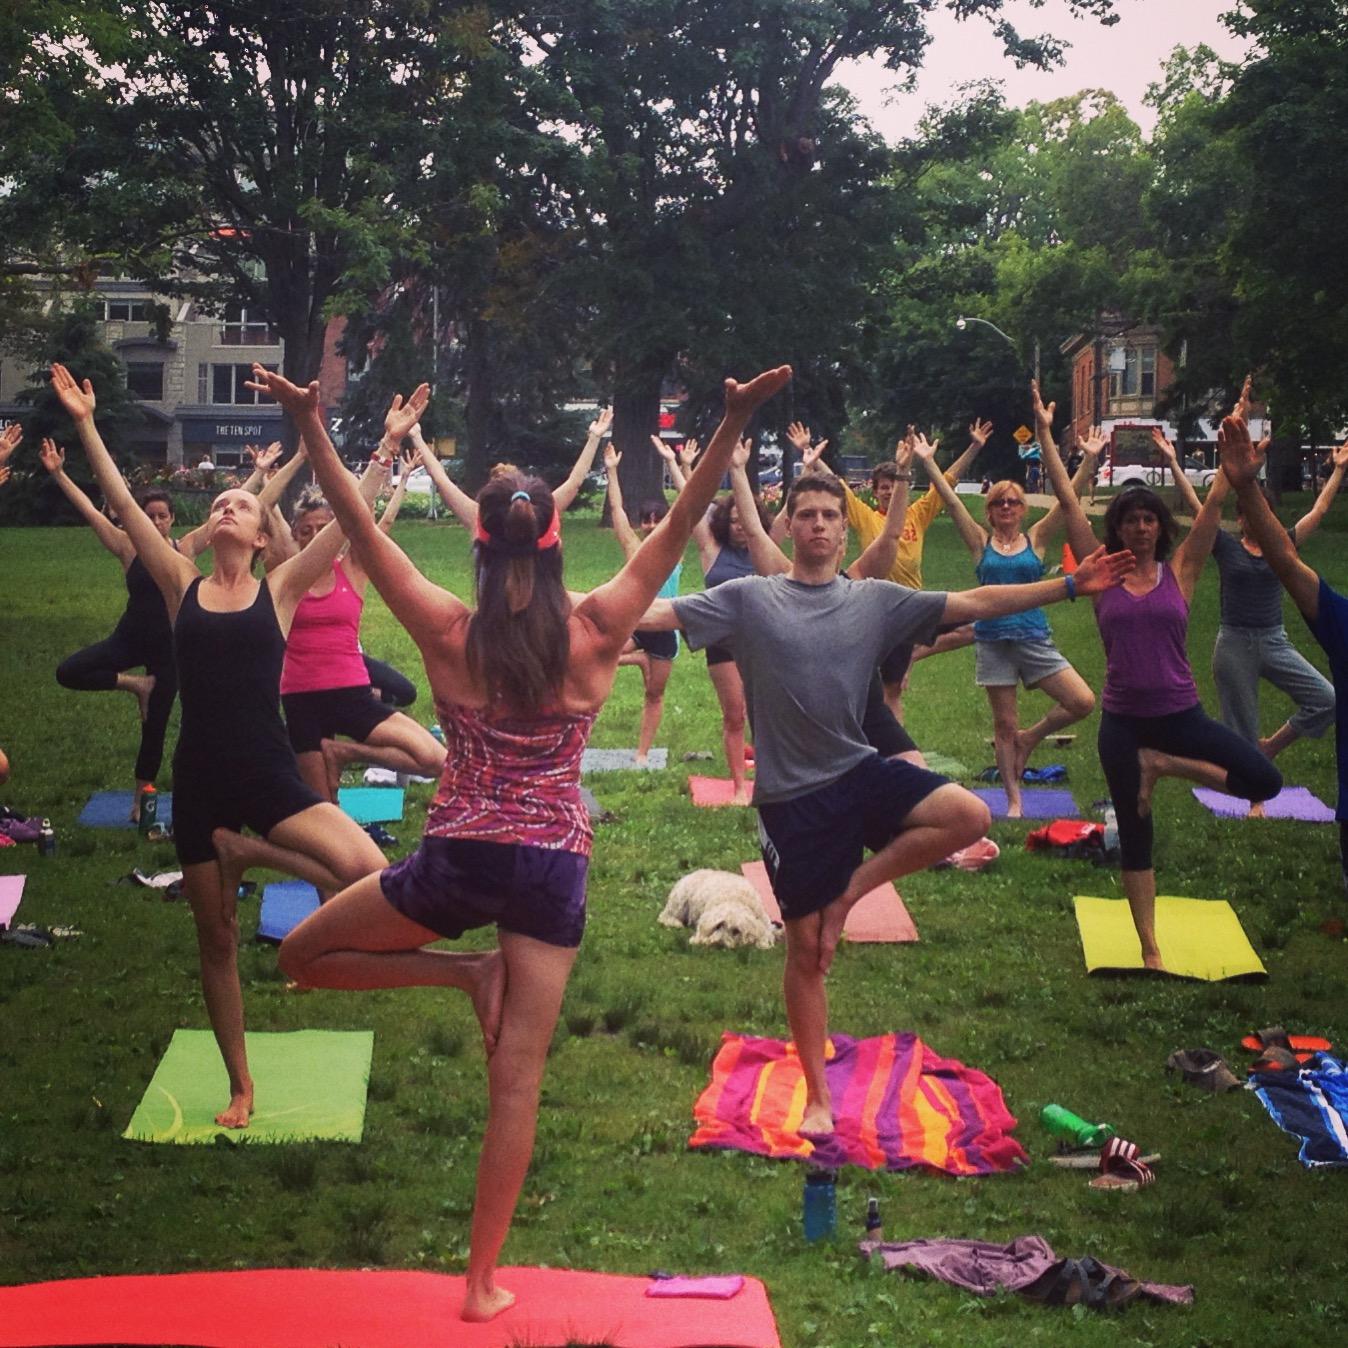 Lisa Rochon teaching an evening yoga class at historic Kew Gardens, Beaches, Toronto.